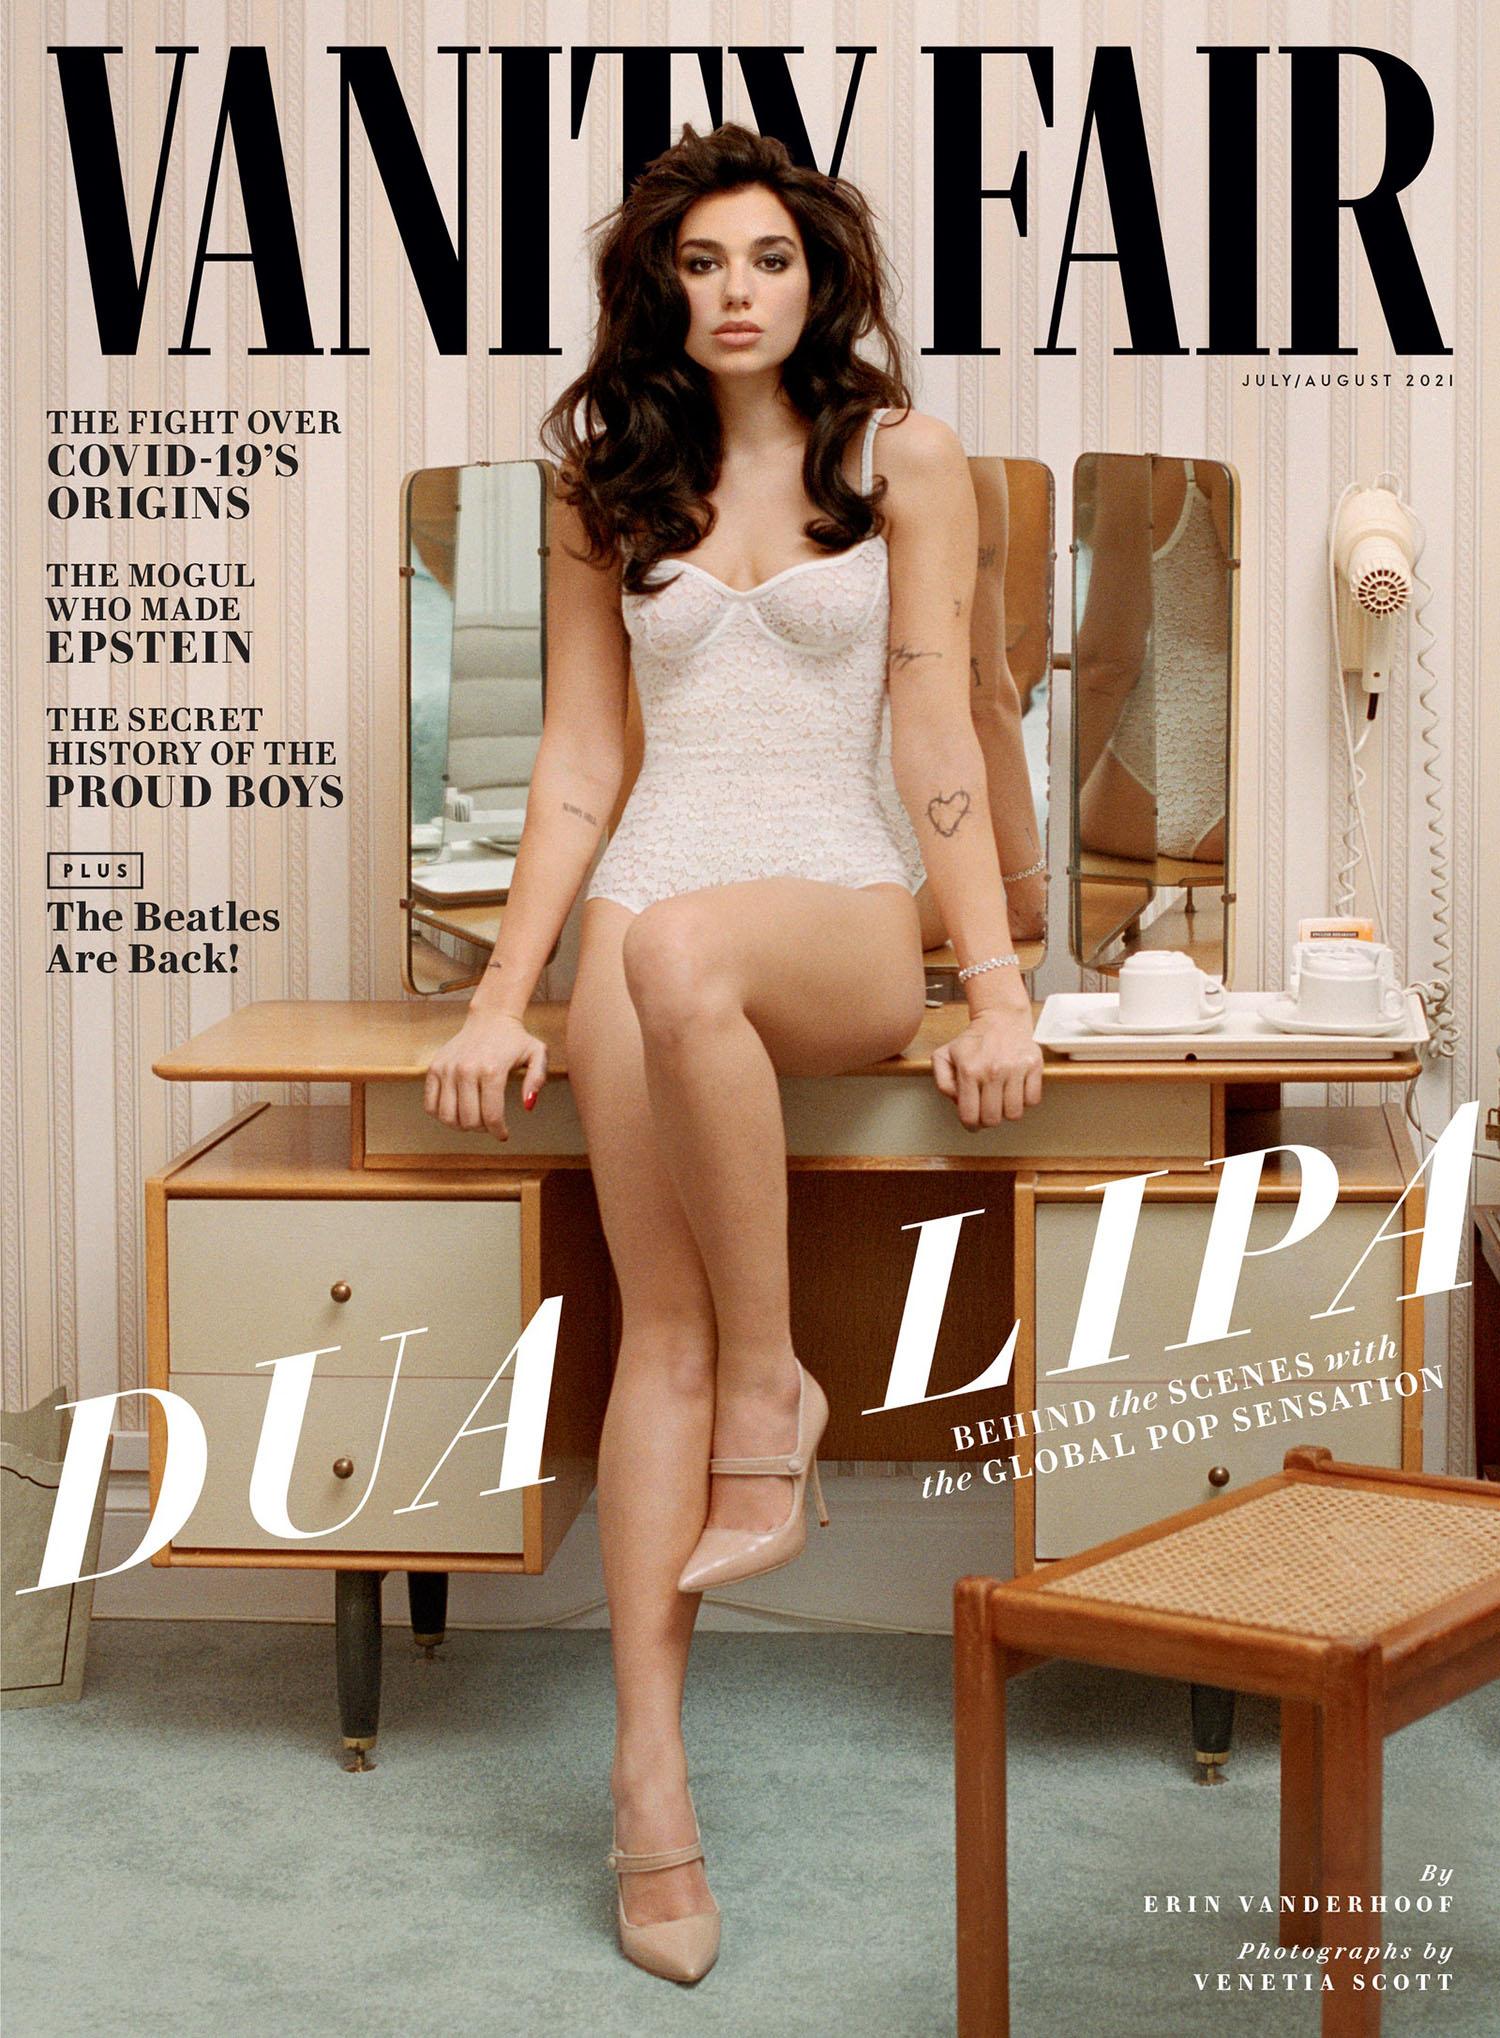 Dua Lipa covers Vanity Fair July August 2021 by Venetia Scott